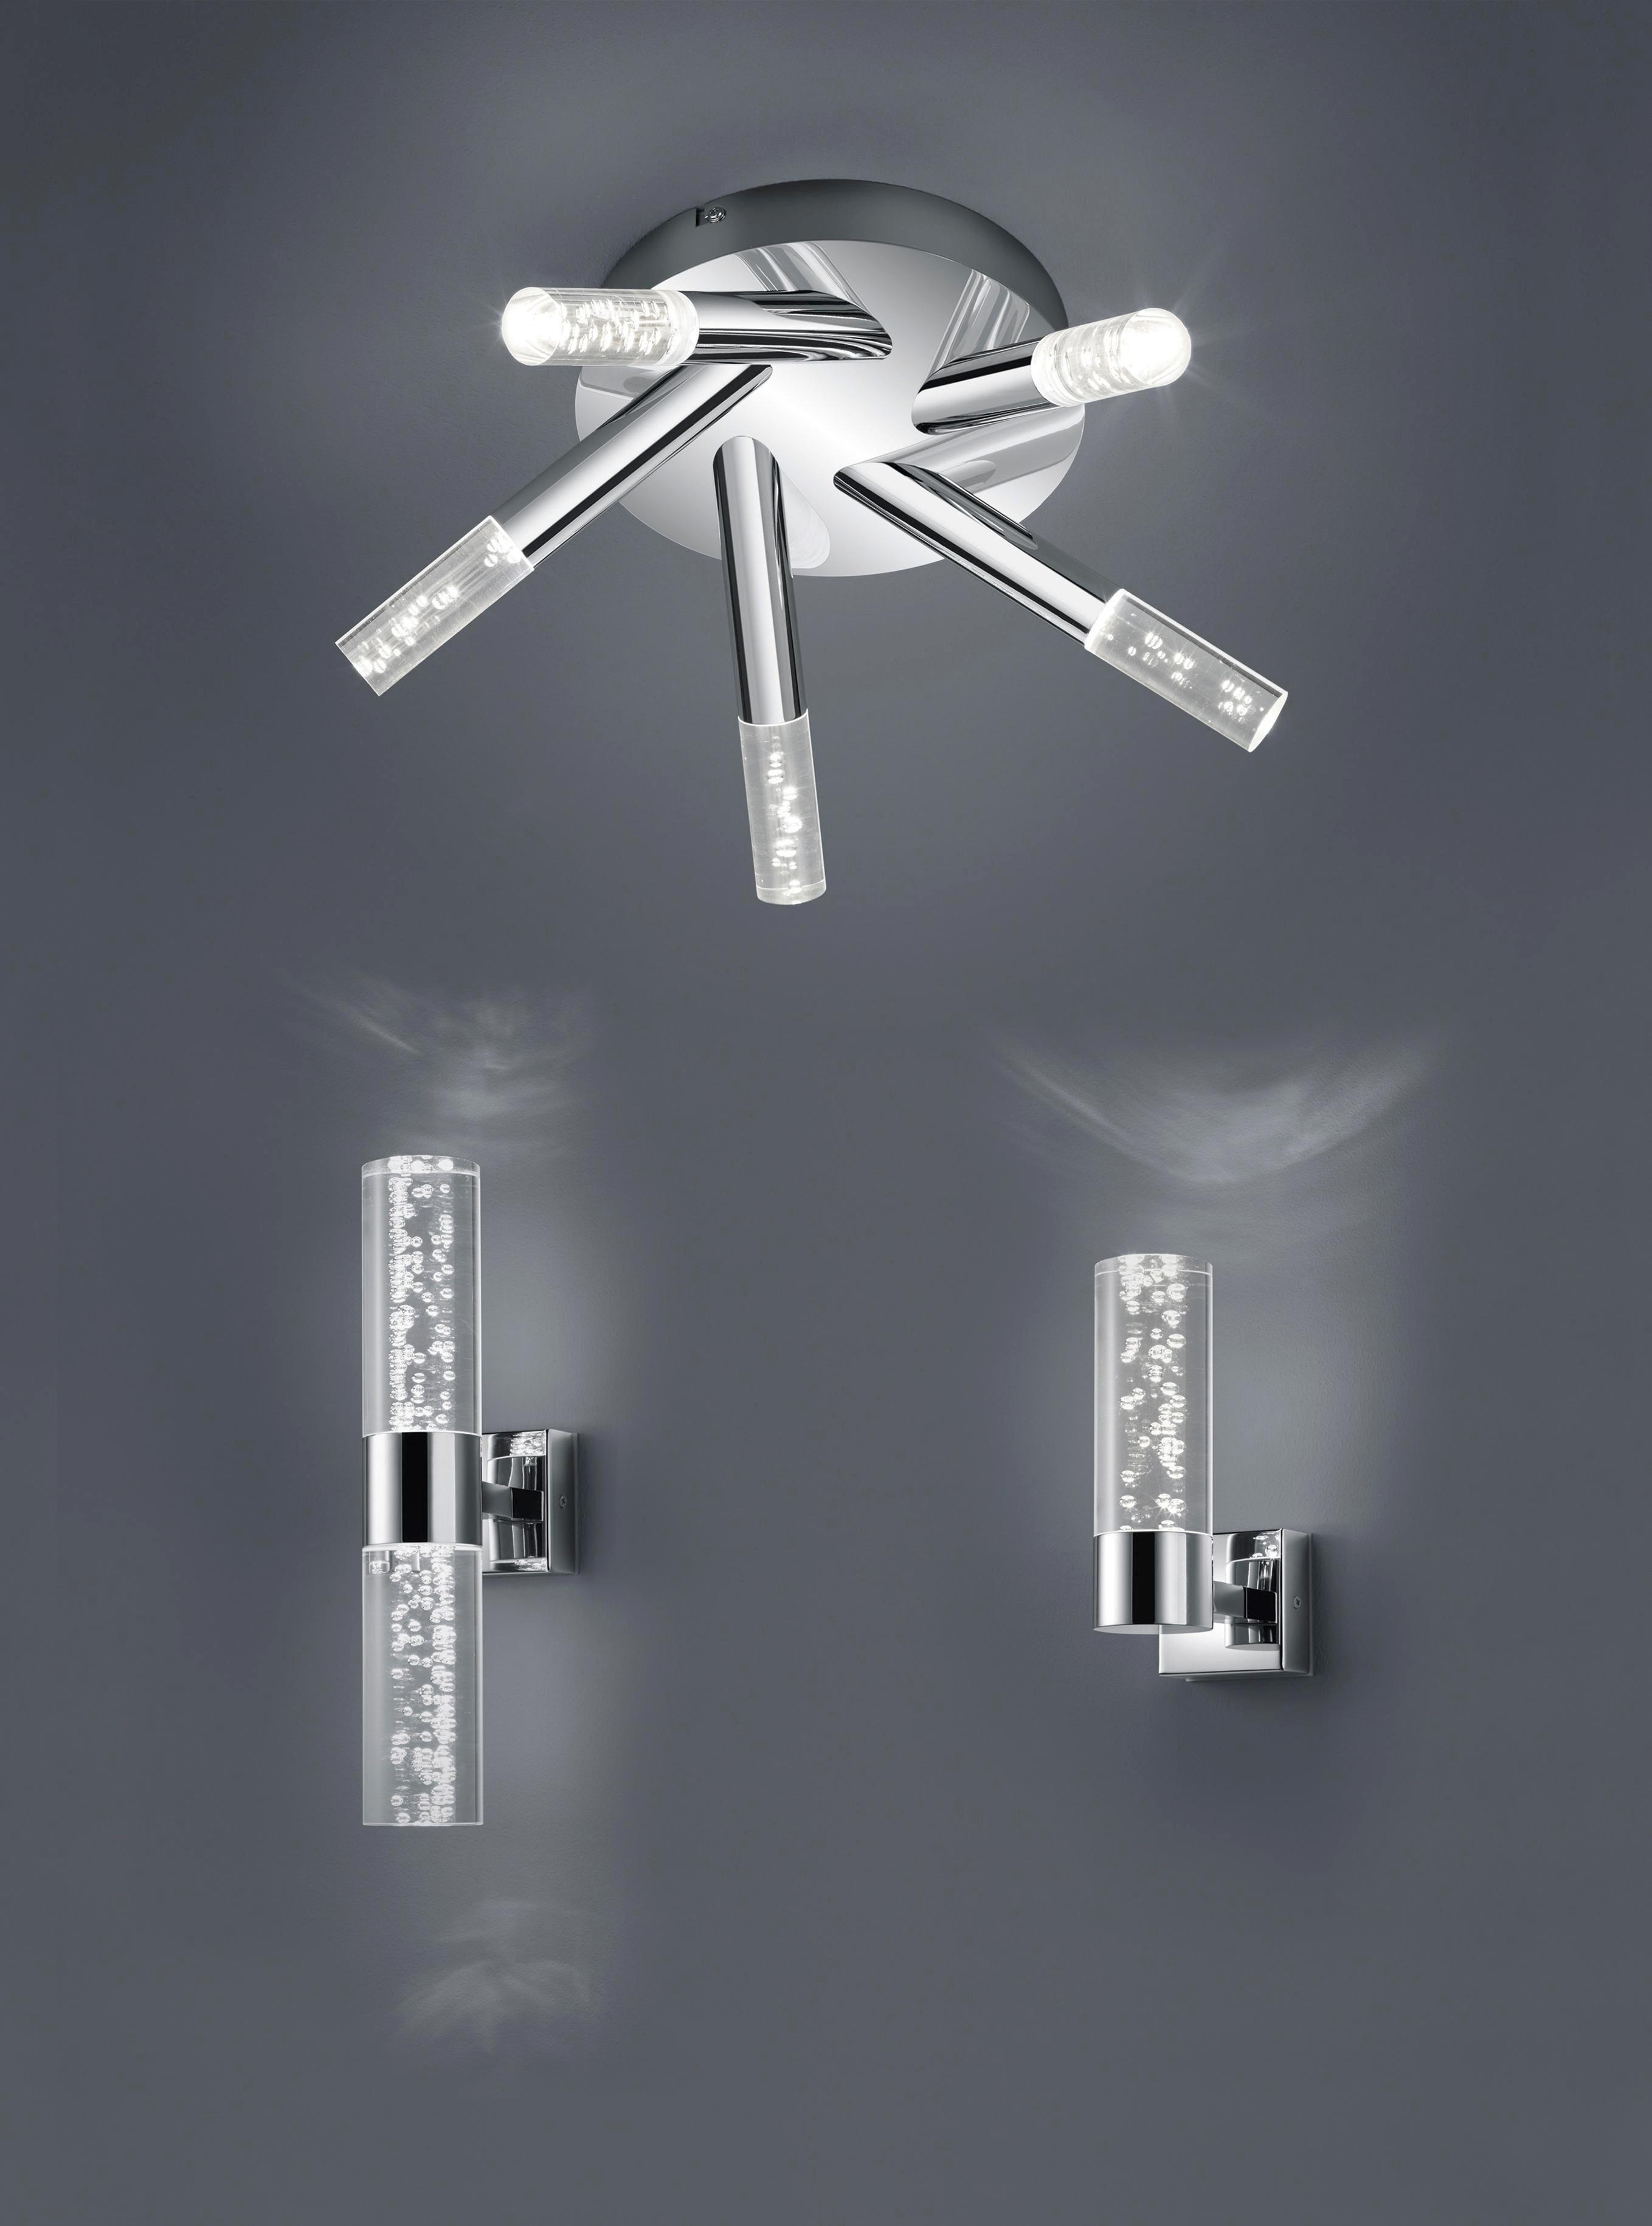 BADEZIMMER-WANDLEUCHTE - Chromfarben/Klar, Design, Kunststoff/Metall (30,0/7,0/12,0cm)